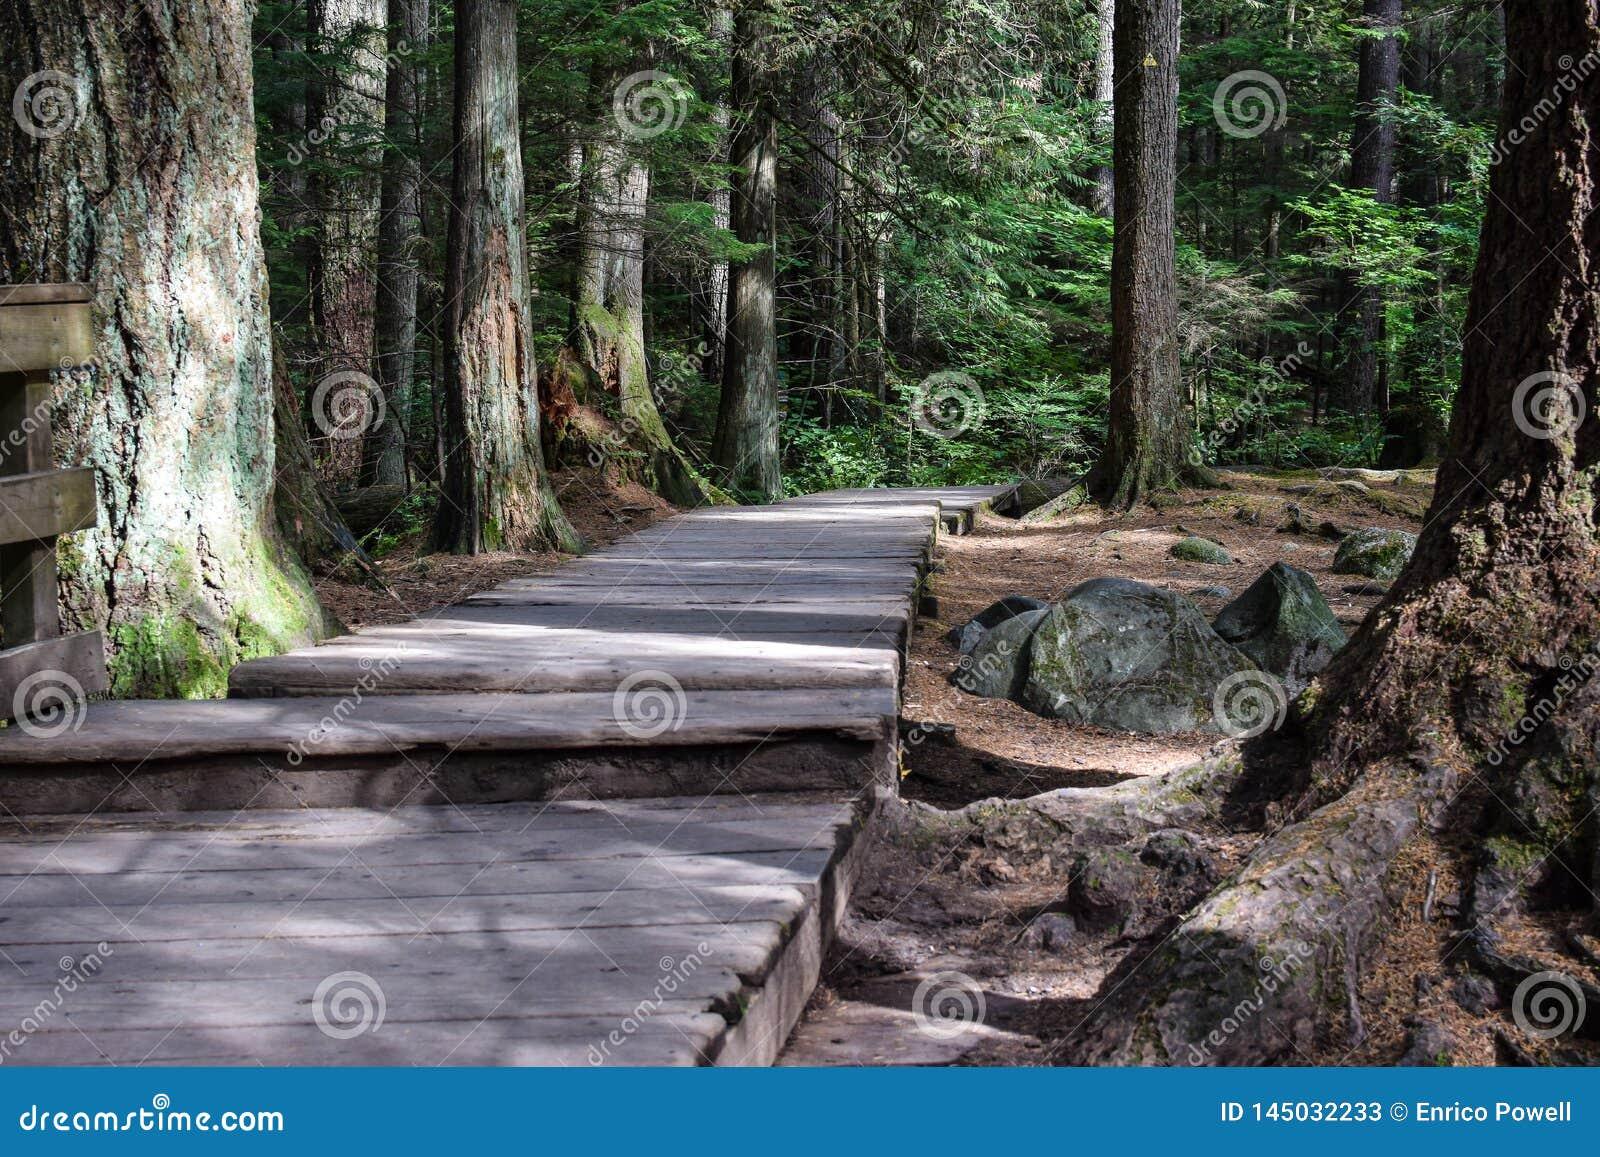 Boardwalk pathway between moss covered trees